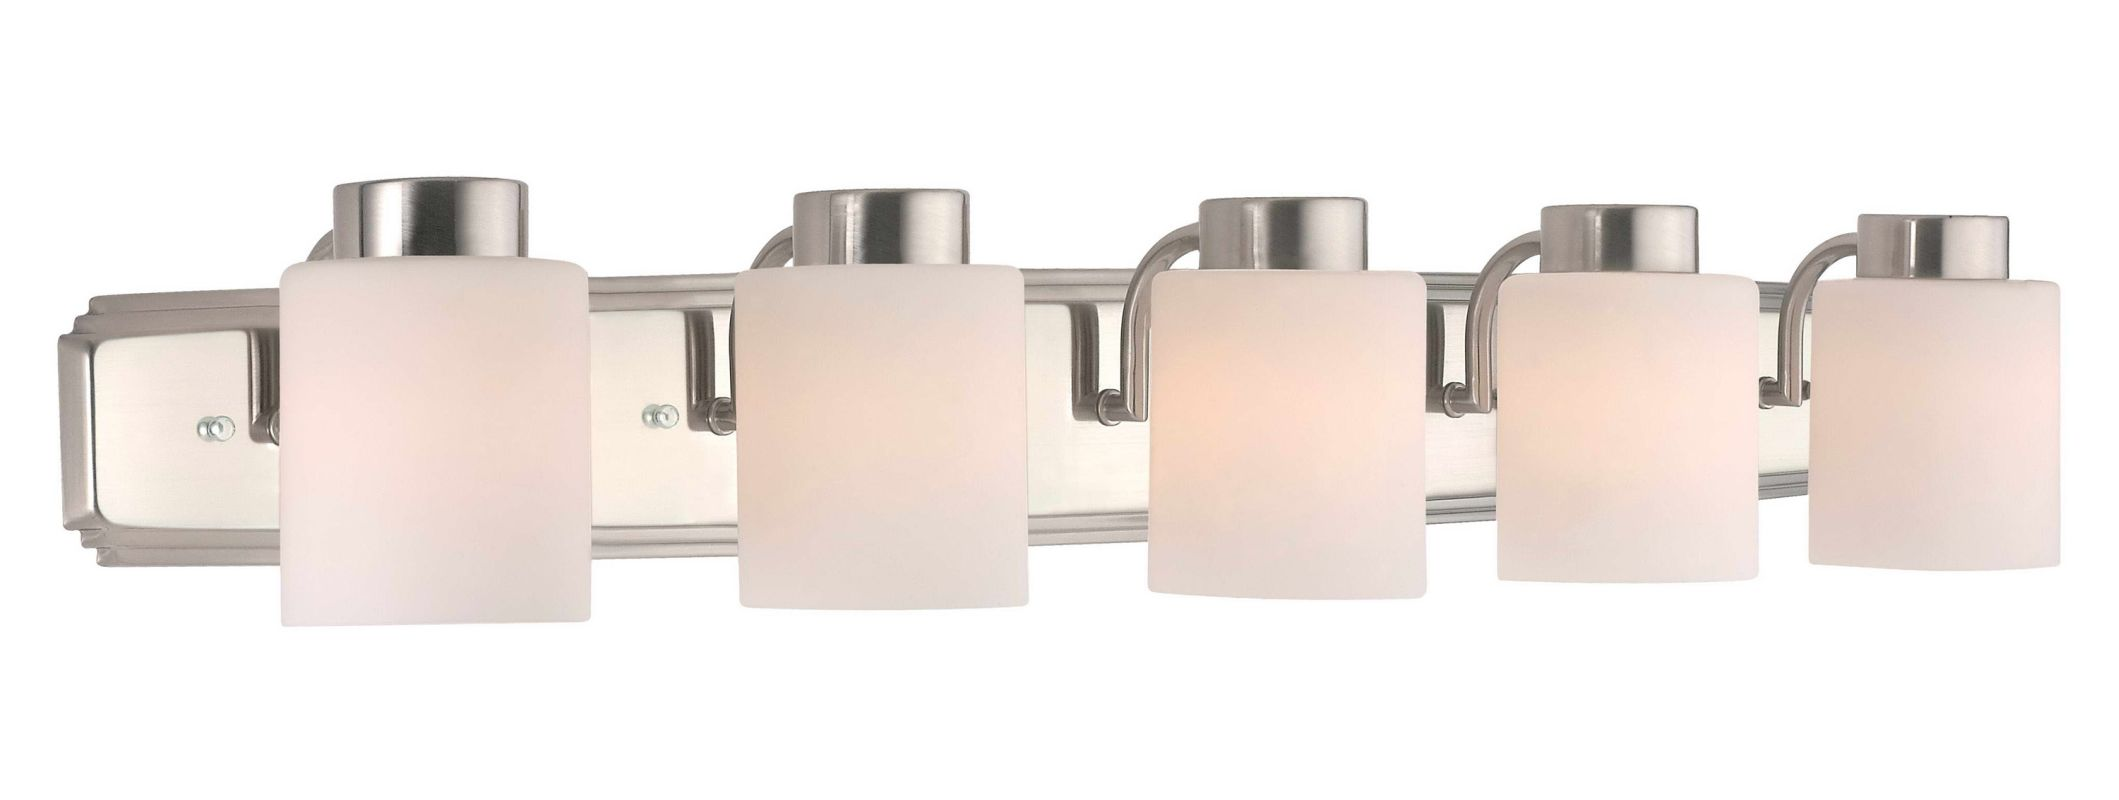 "Dolan Designs 3505 5 Light 6"" Height Bathroom Vanity Light Satin"